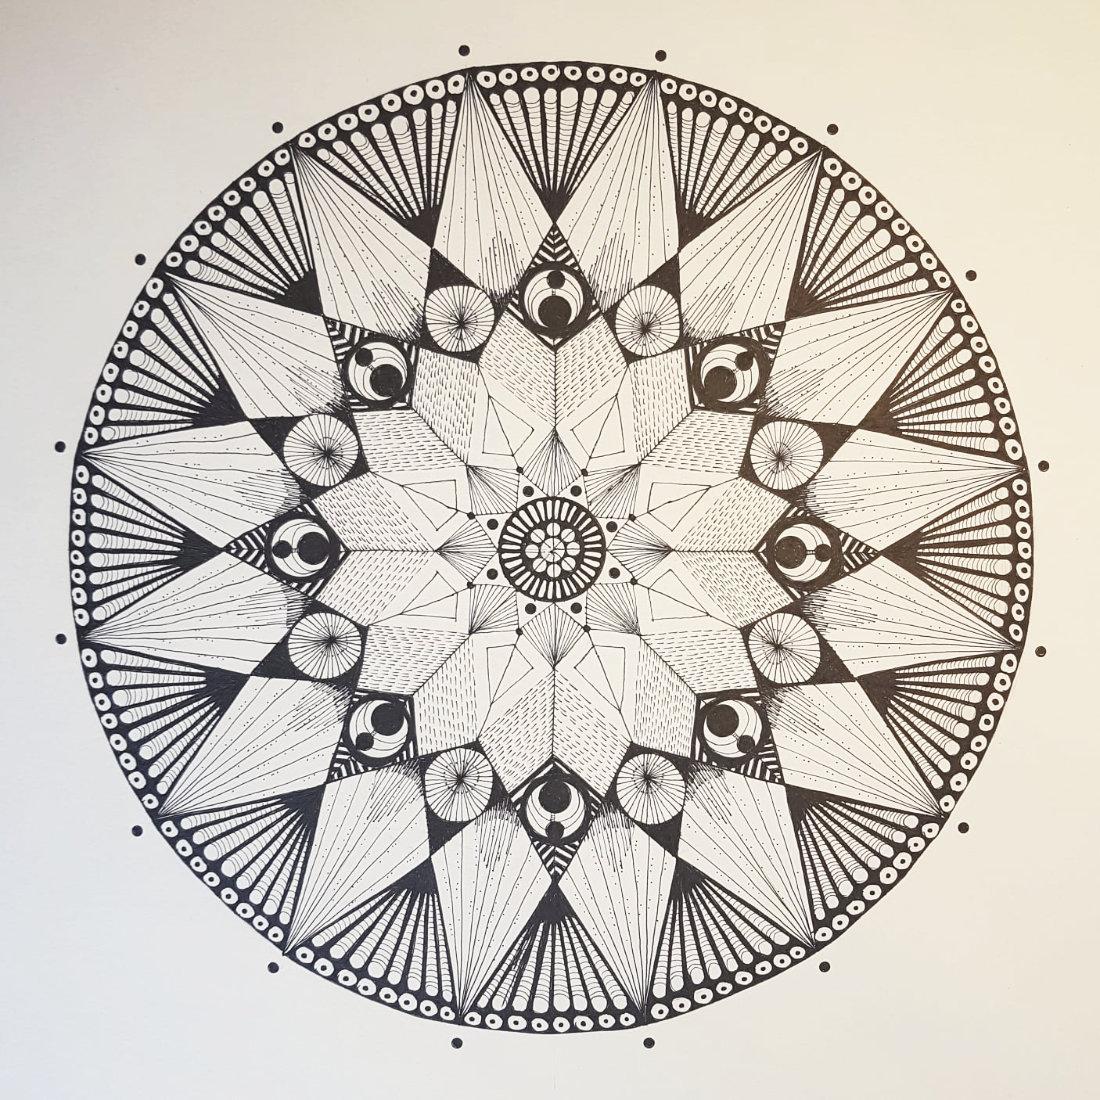 Mandala von Claudia Schwertfeger (Kurs Angelika Hentschel)